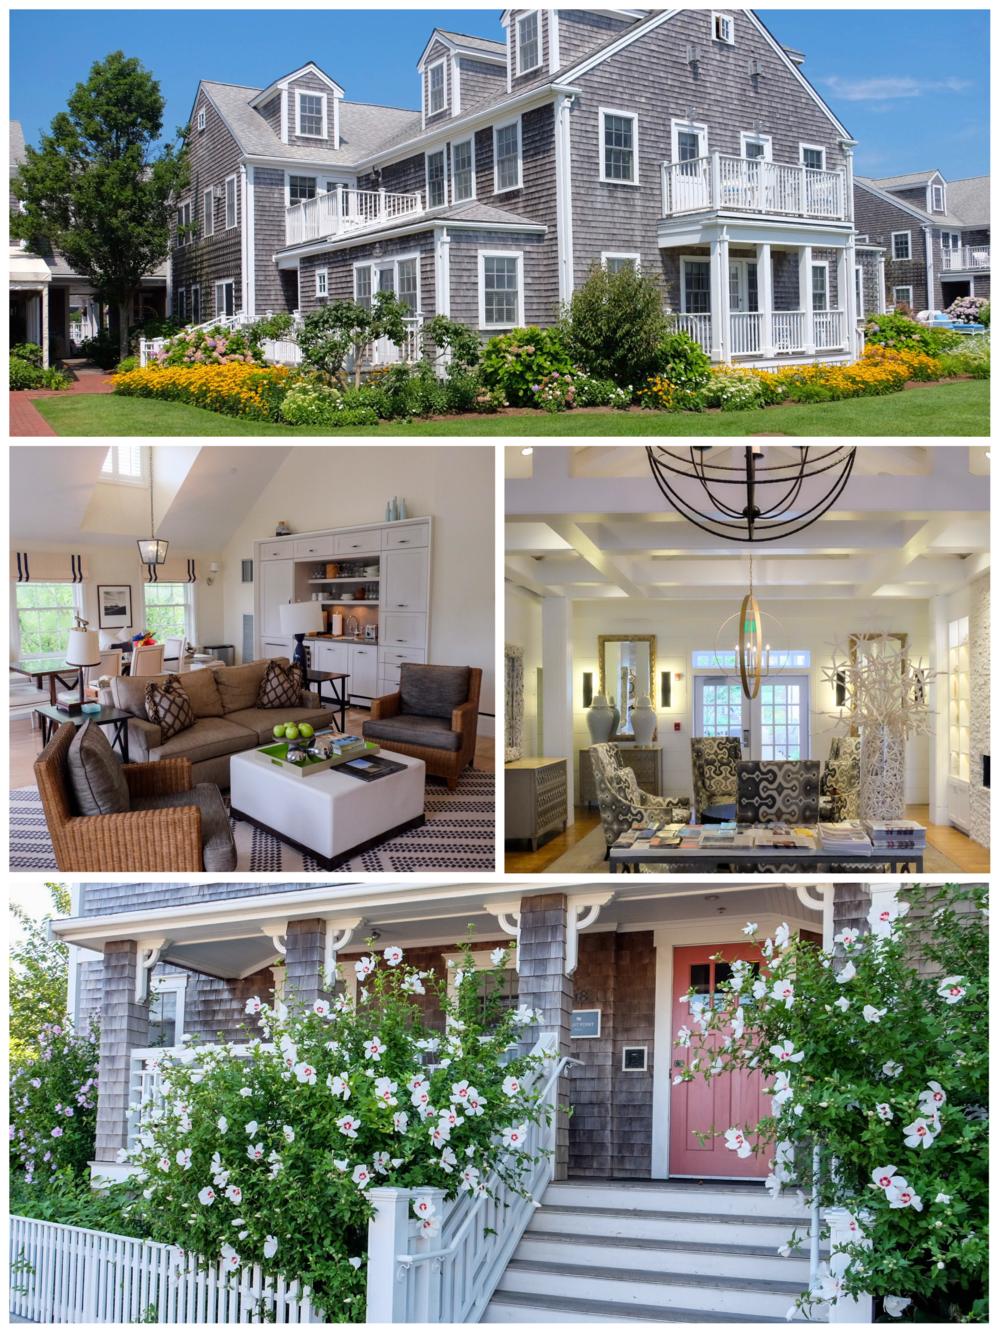 LaurenSchwaiger-Style-Travel-Blog-Nantucket-Travel-Guide-White-Elephant-Hotel.jpg